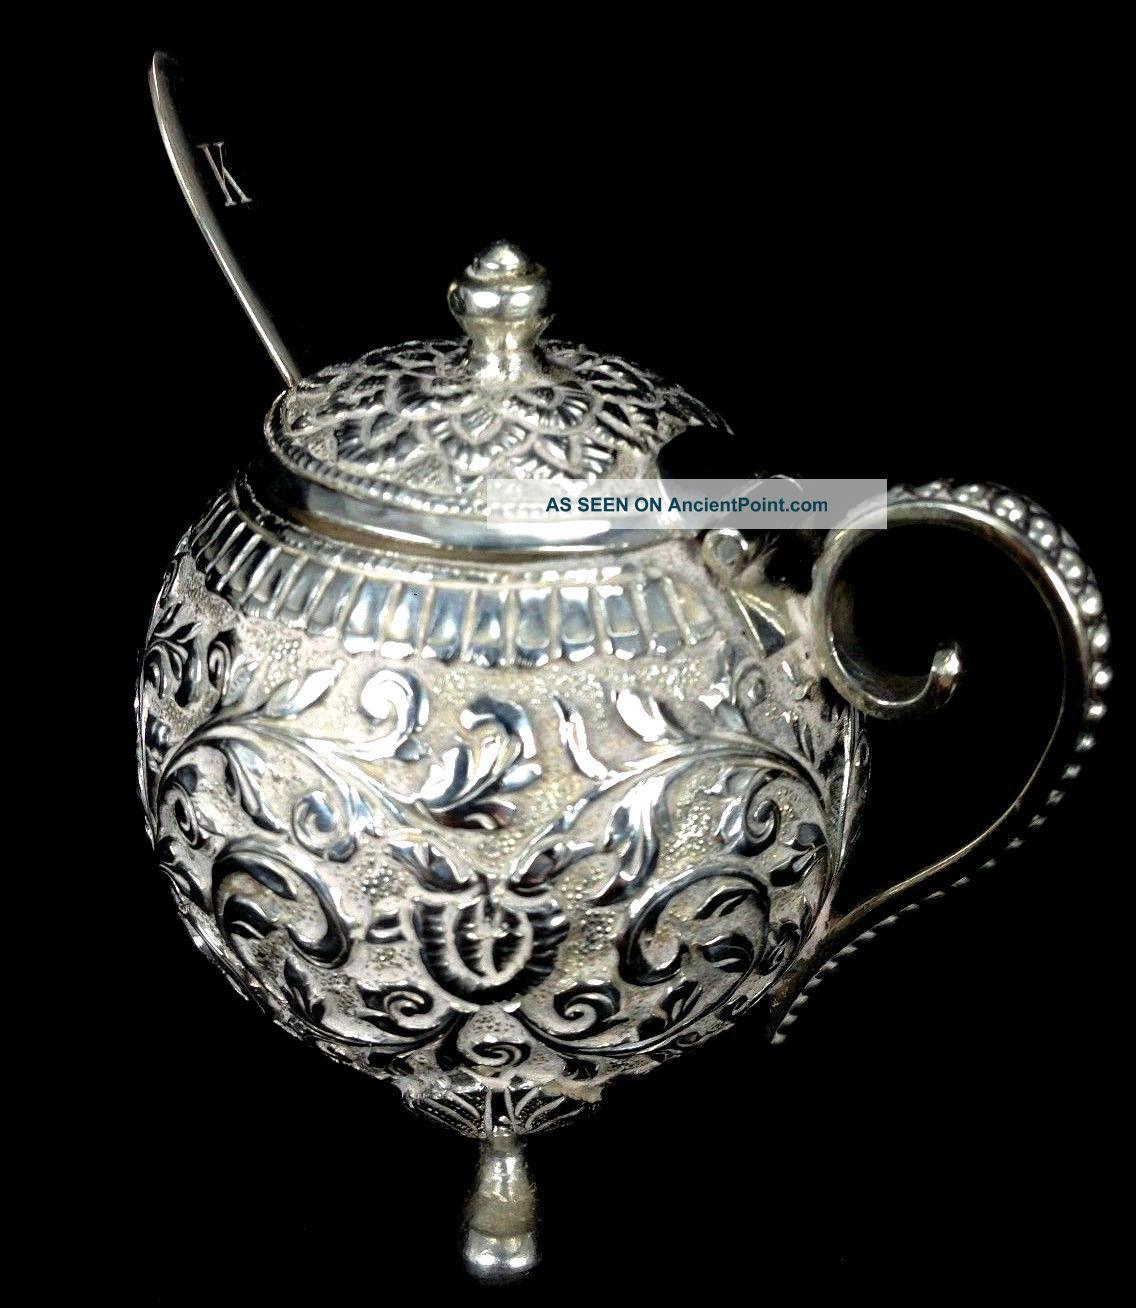 Magnificent Antique Victorian Sterling Silver Teapot Shape & Spoon Salt Cellar Salt Cellars photo